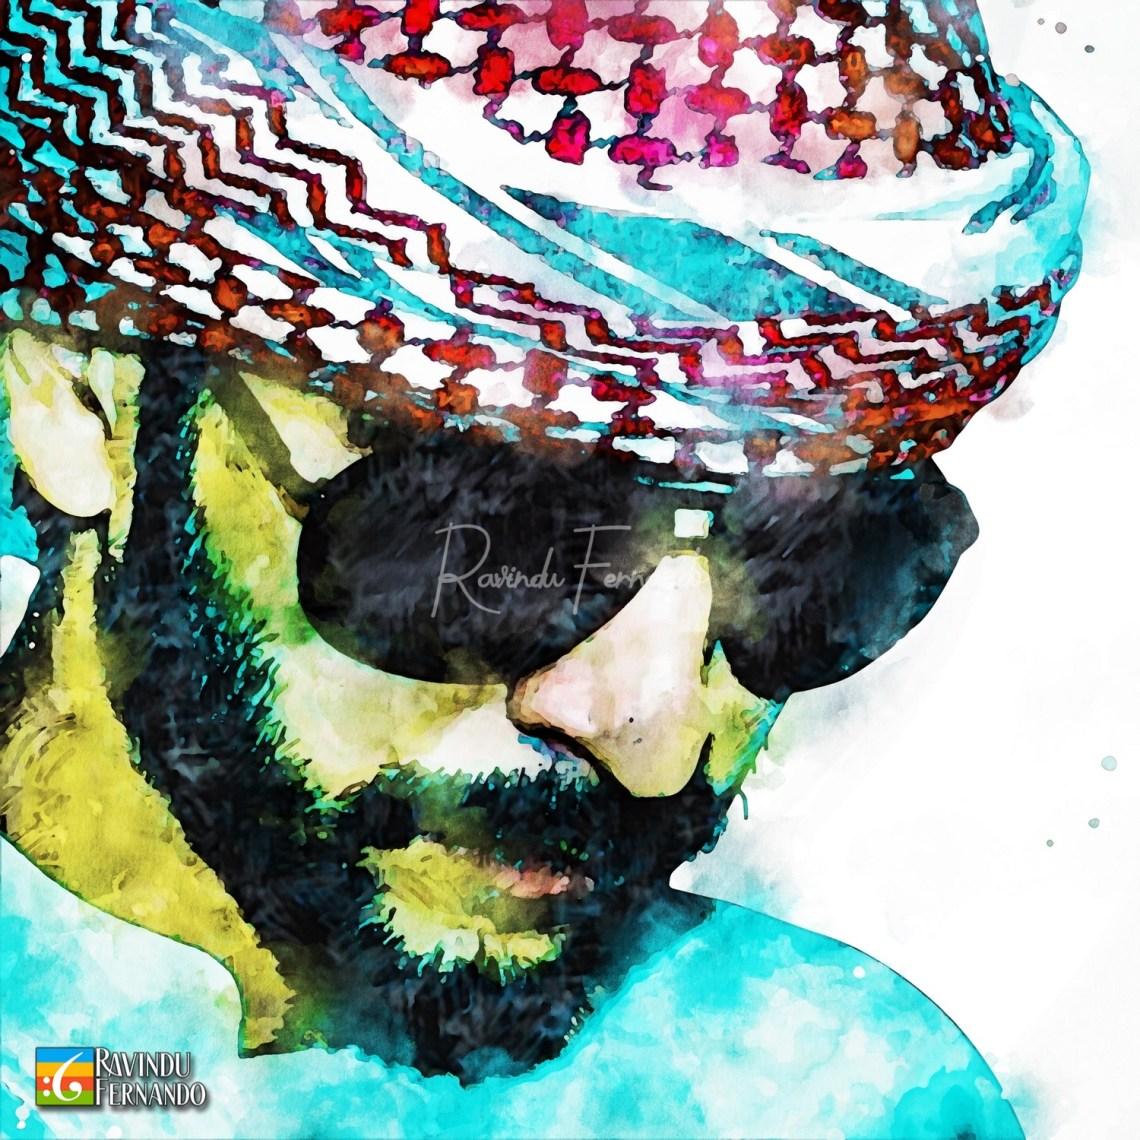 Madhushanka Jayamanne - Digital Watercolor Painting